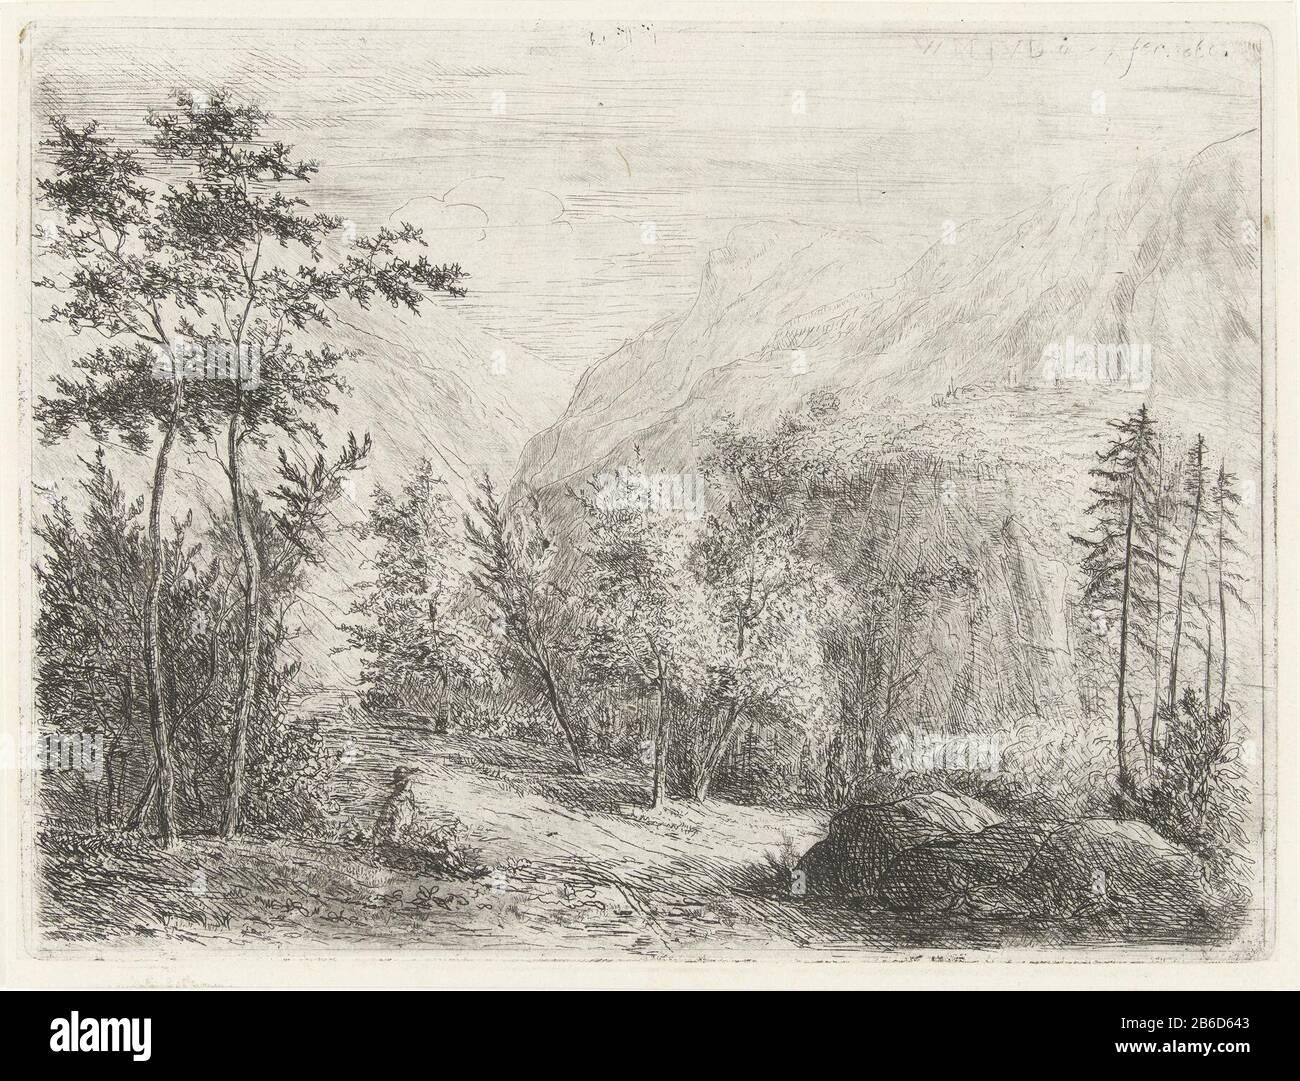 foto de 1815 1902 Stock Photos & 1815 1902 Stock Images - Alamy